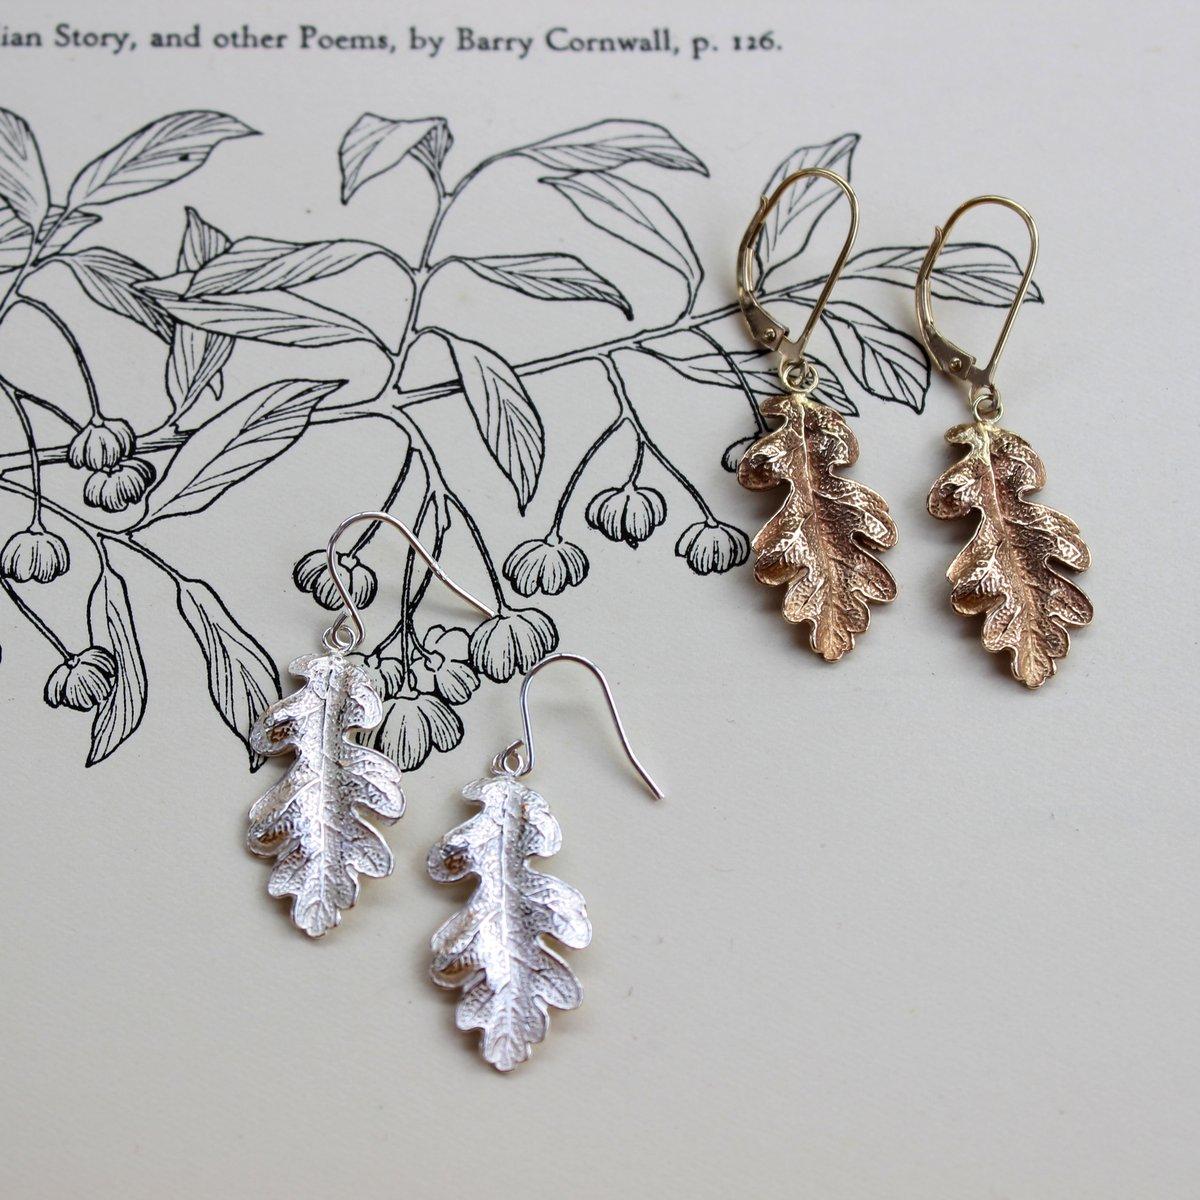 Image of oak leaf earrings (silver or 9ct gold)